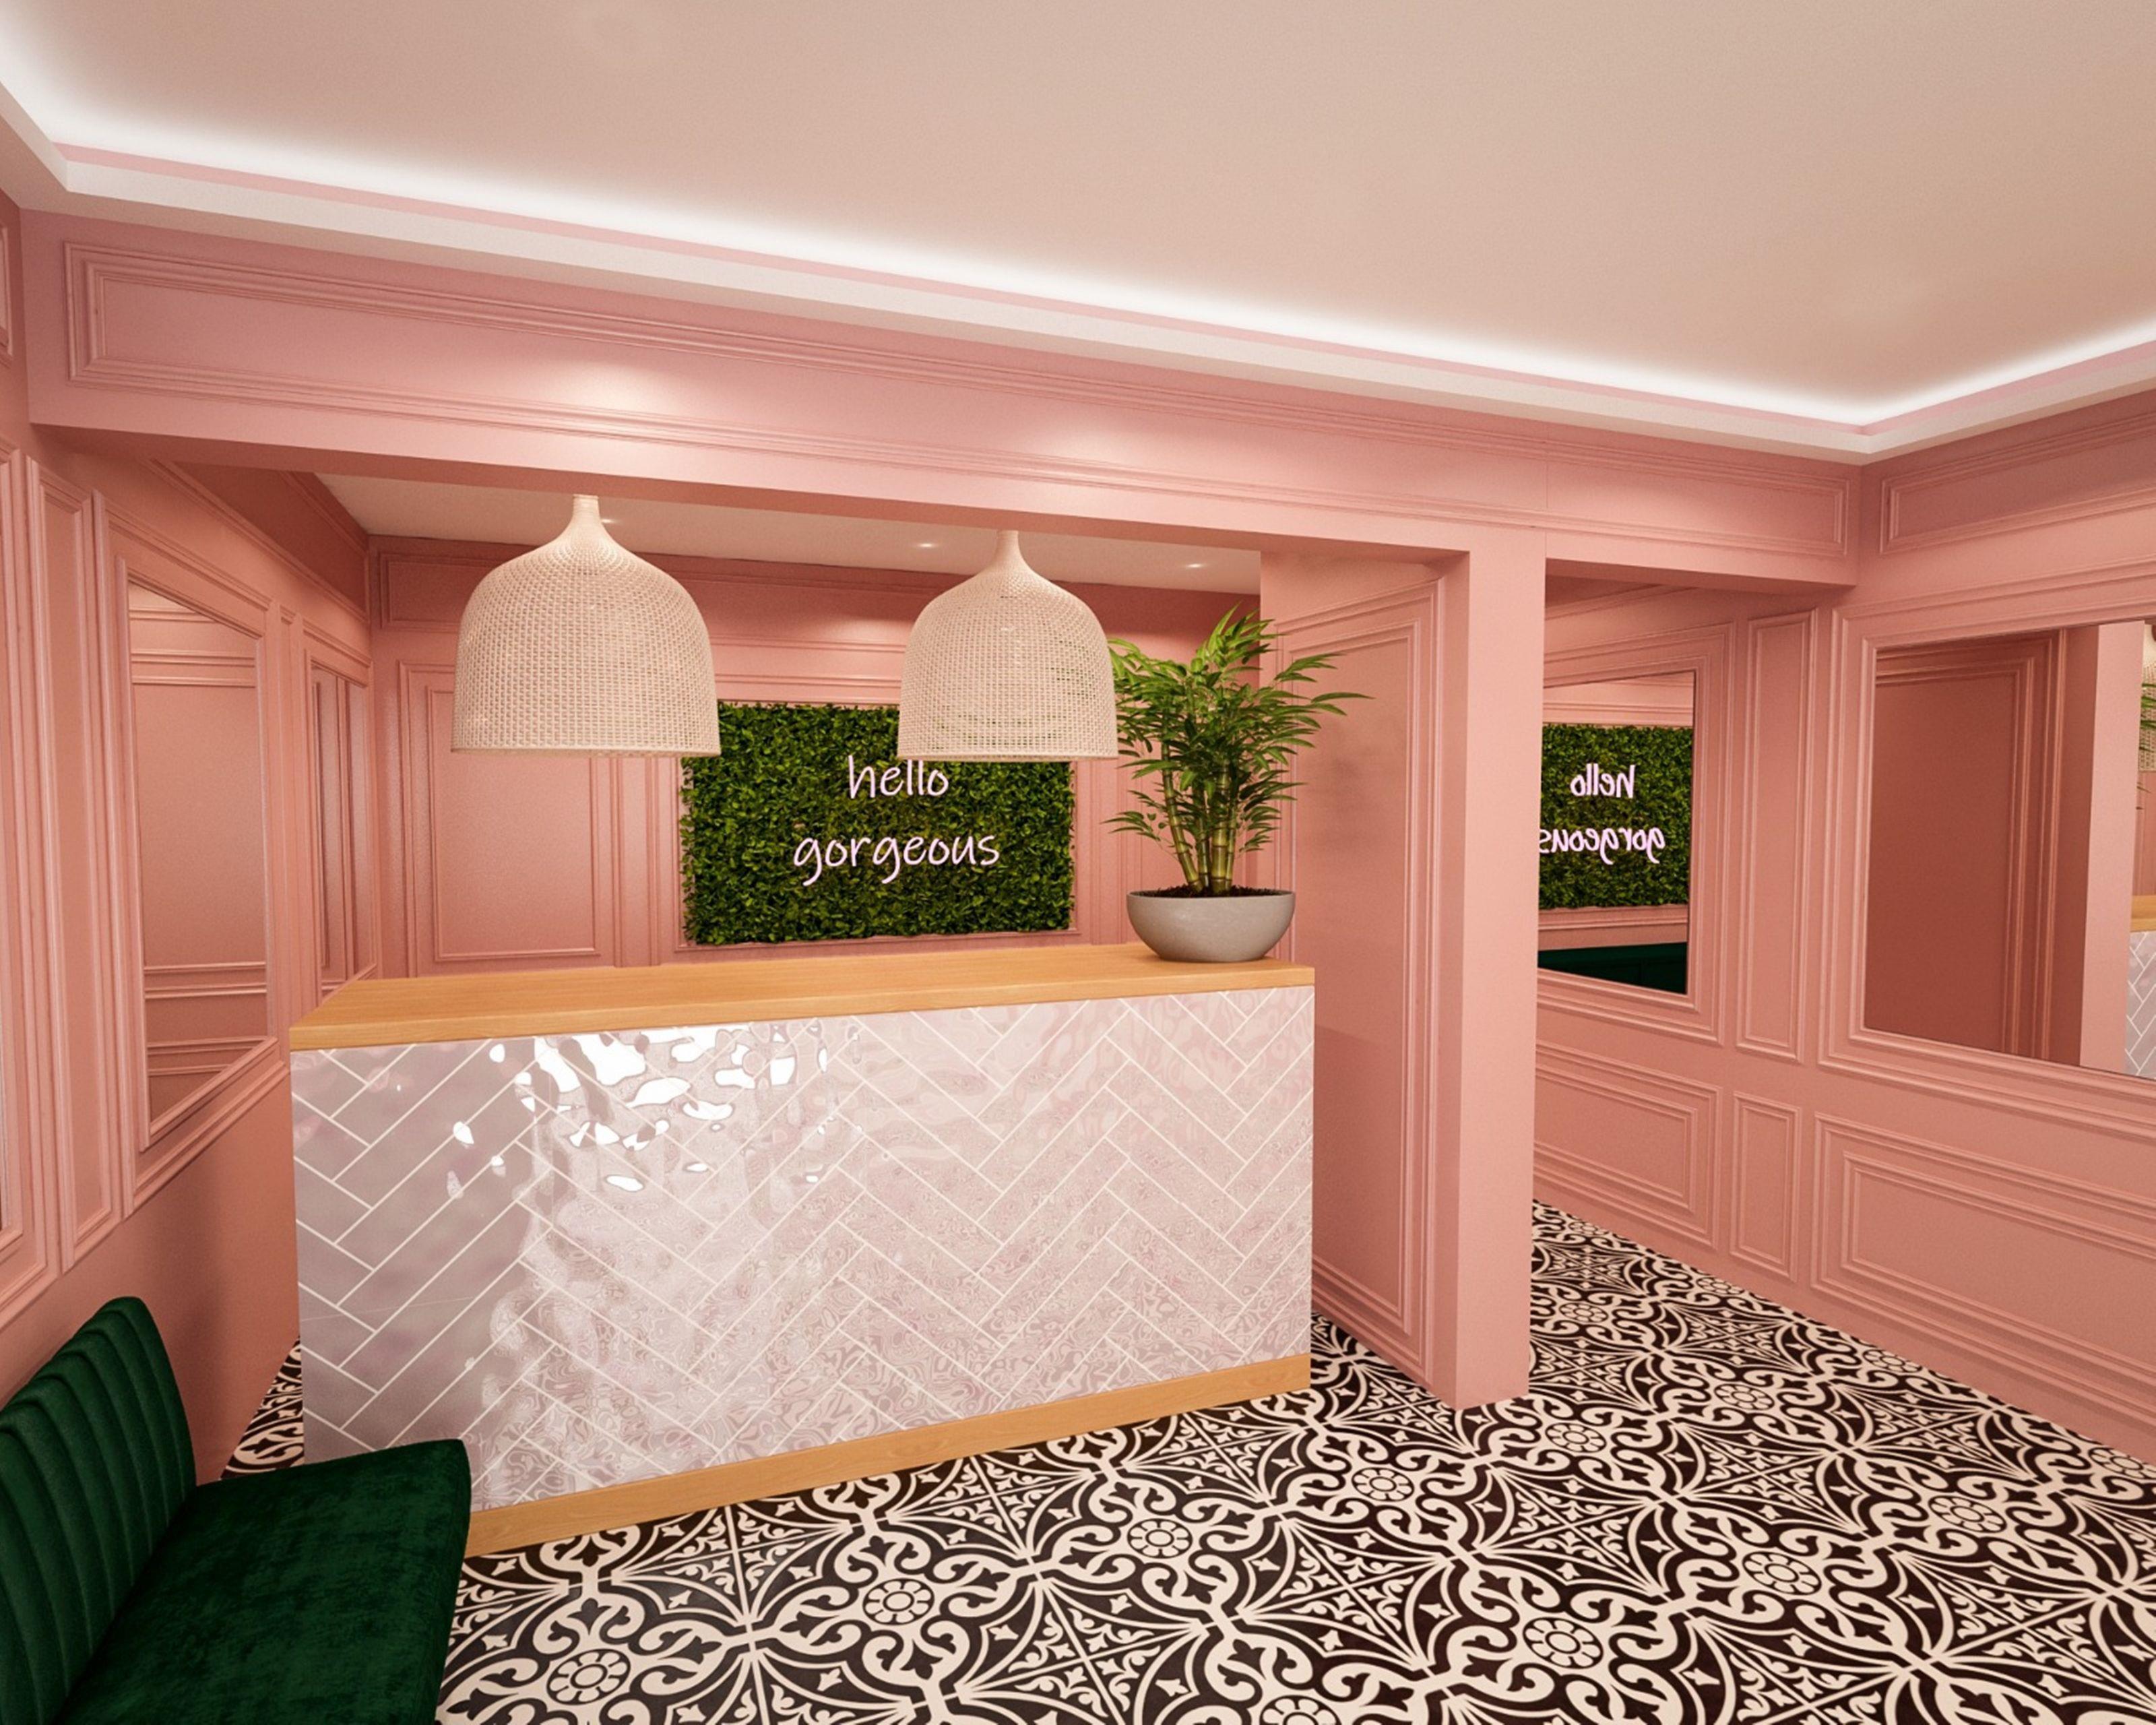 http://www.orextravel.sk/OREX/hotelphotos/anjeliq-downtown-hotel-general-0032.jpg